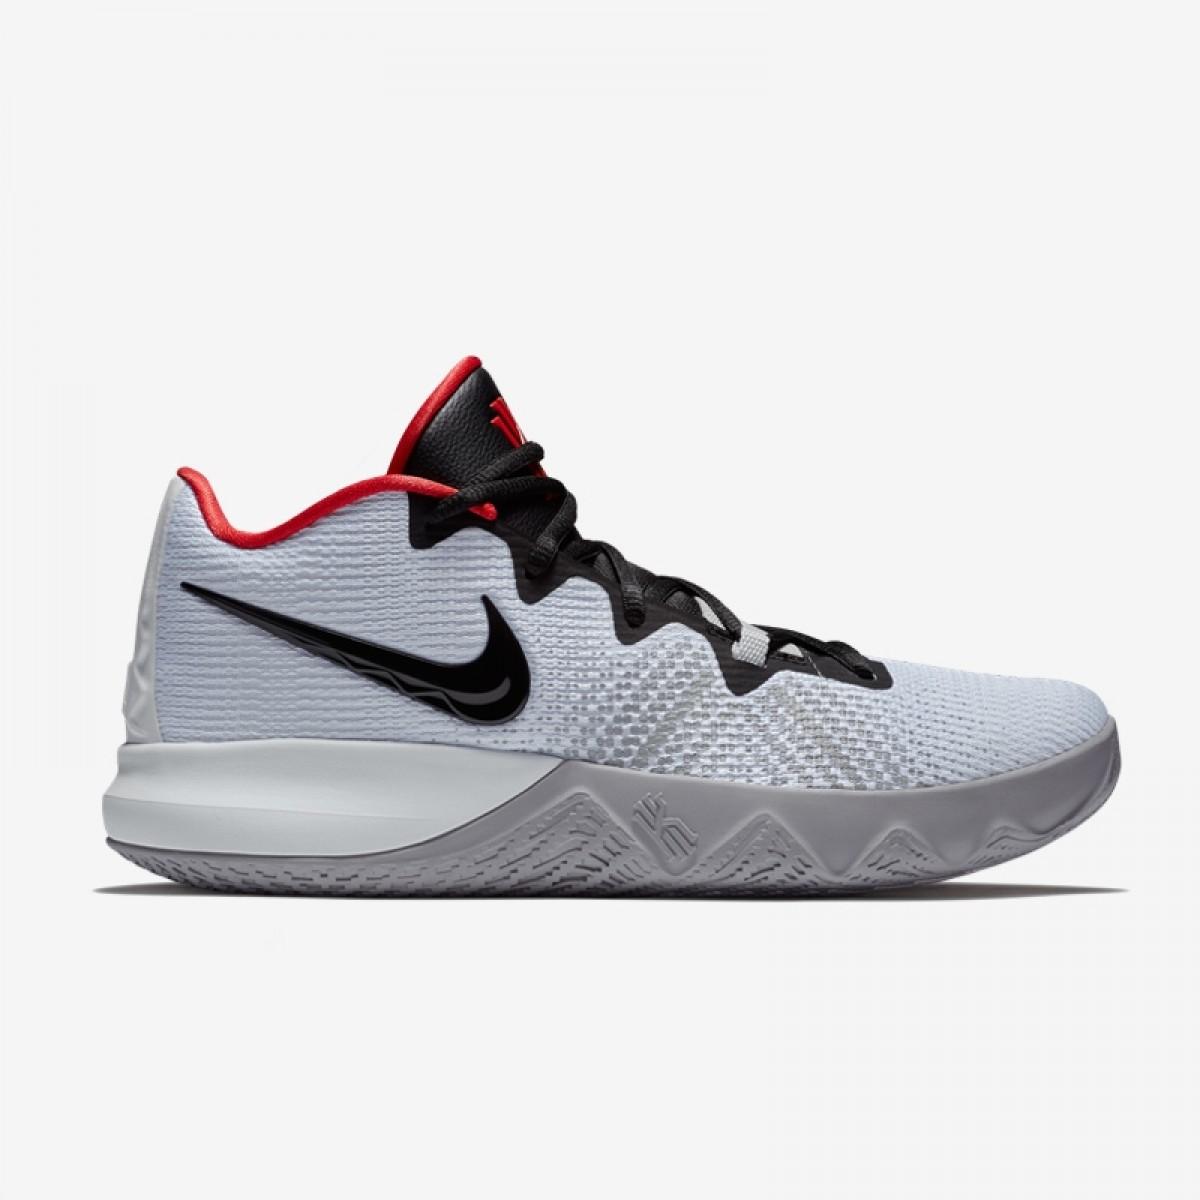 Nike Kyrie Flytrap 'Advanced'